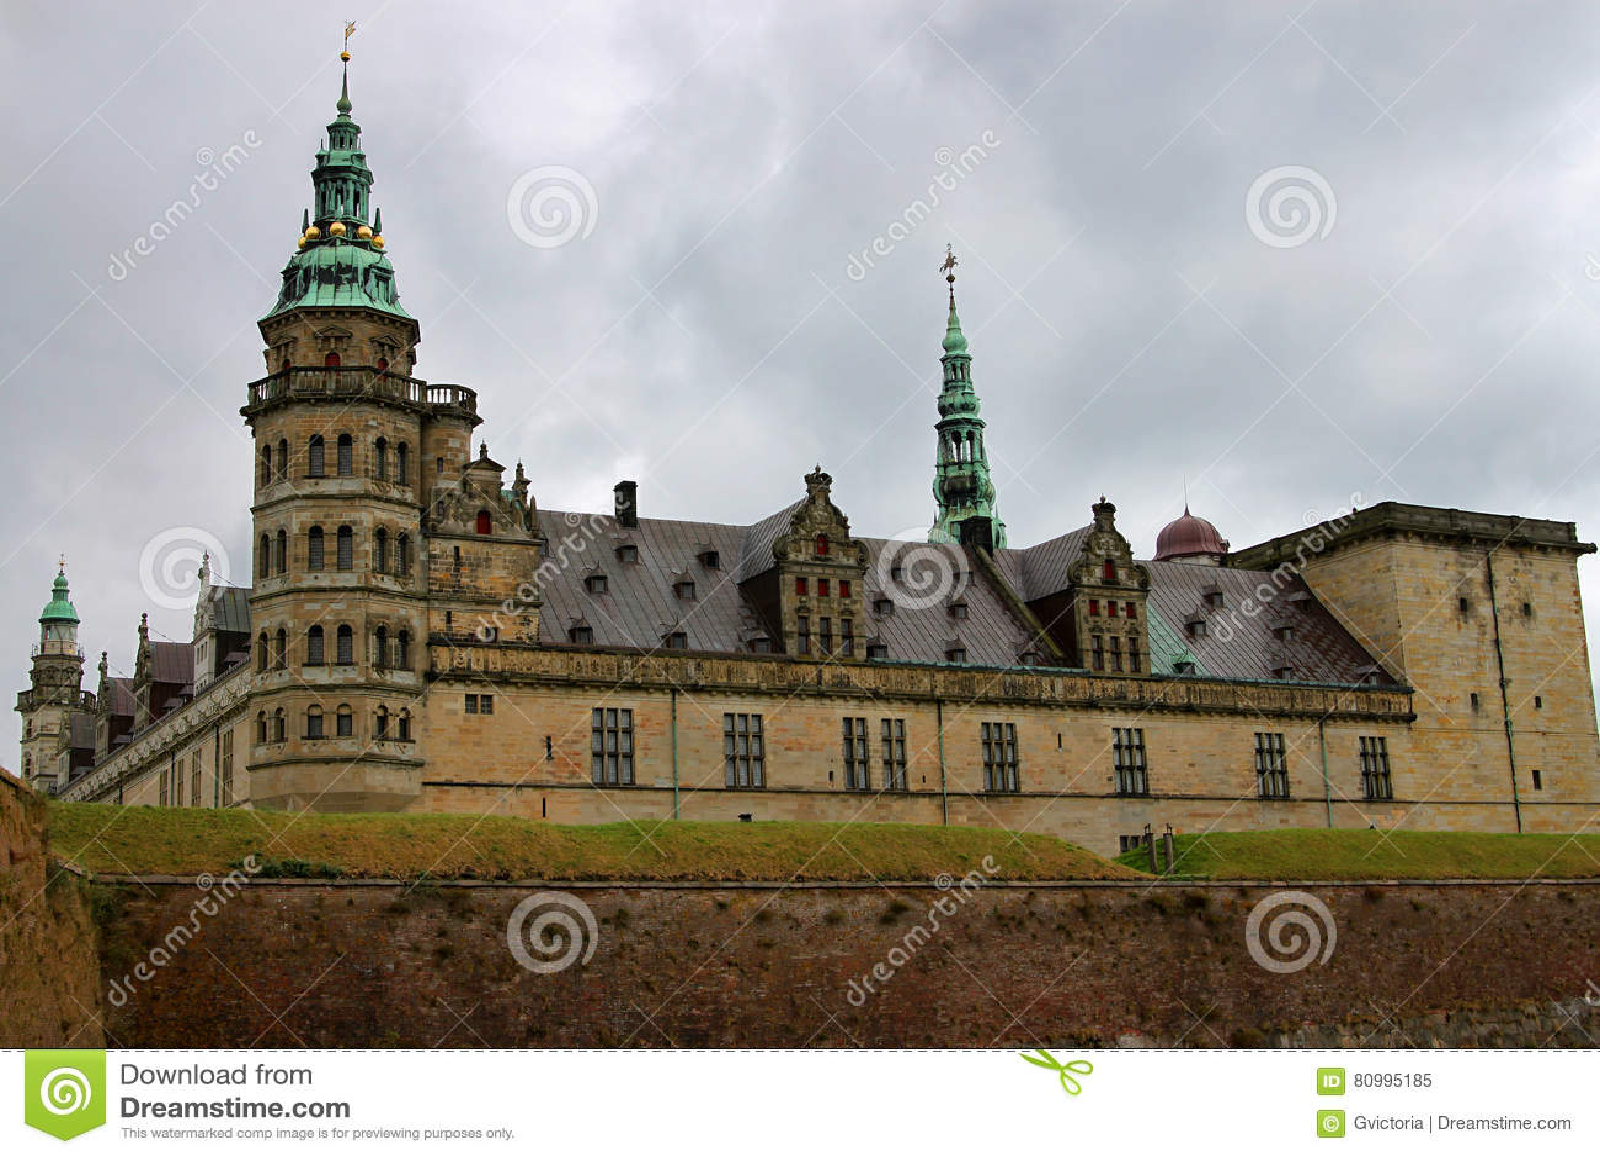 Castillo de Kronborg o de Elsinore en Copenhague, Dinamarca